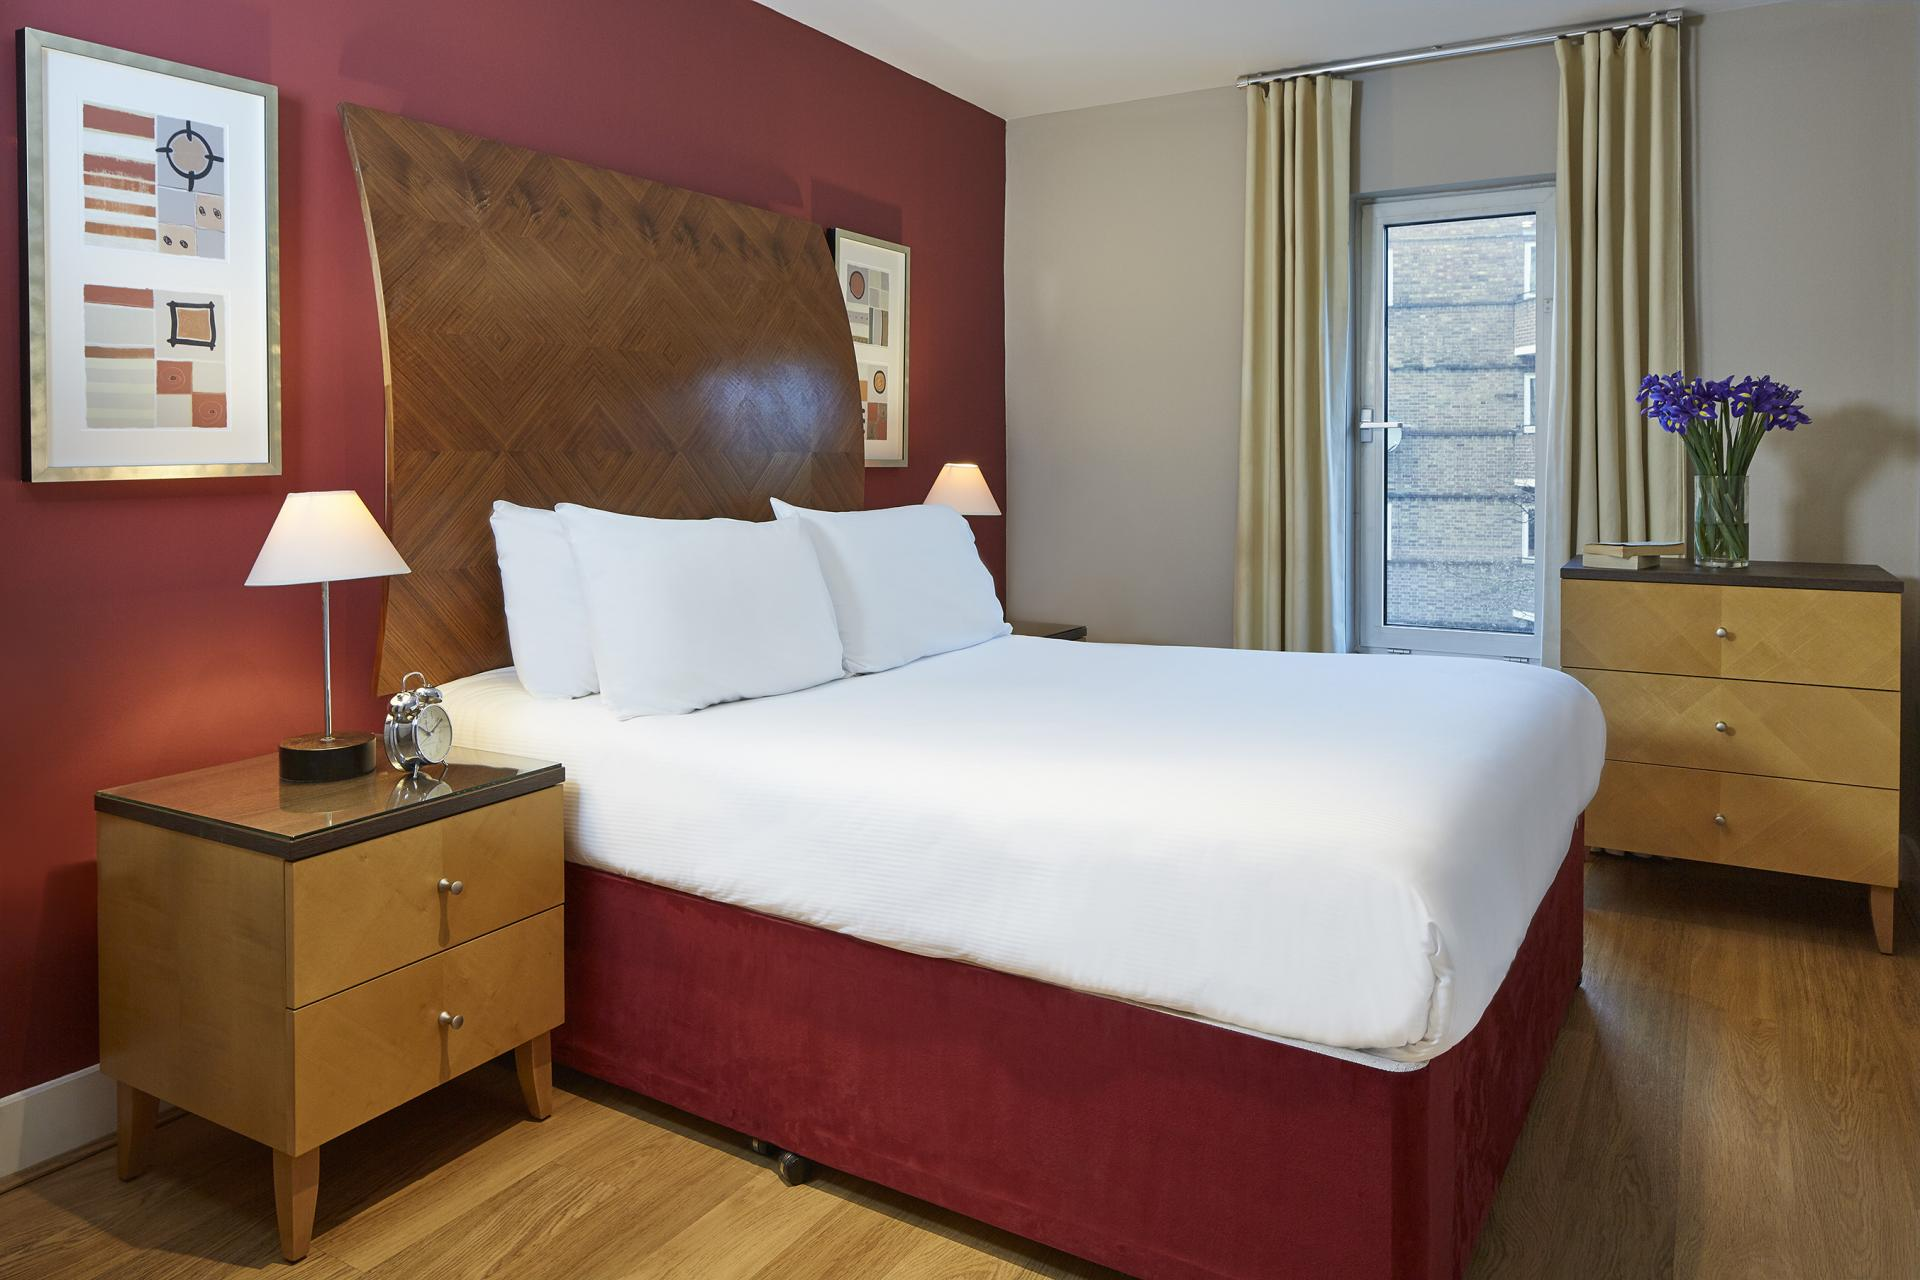 Bed at Empire Square Apartments, London Bridge, London - Citybase Apartments